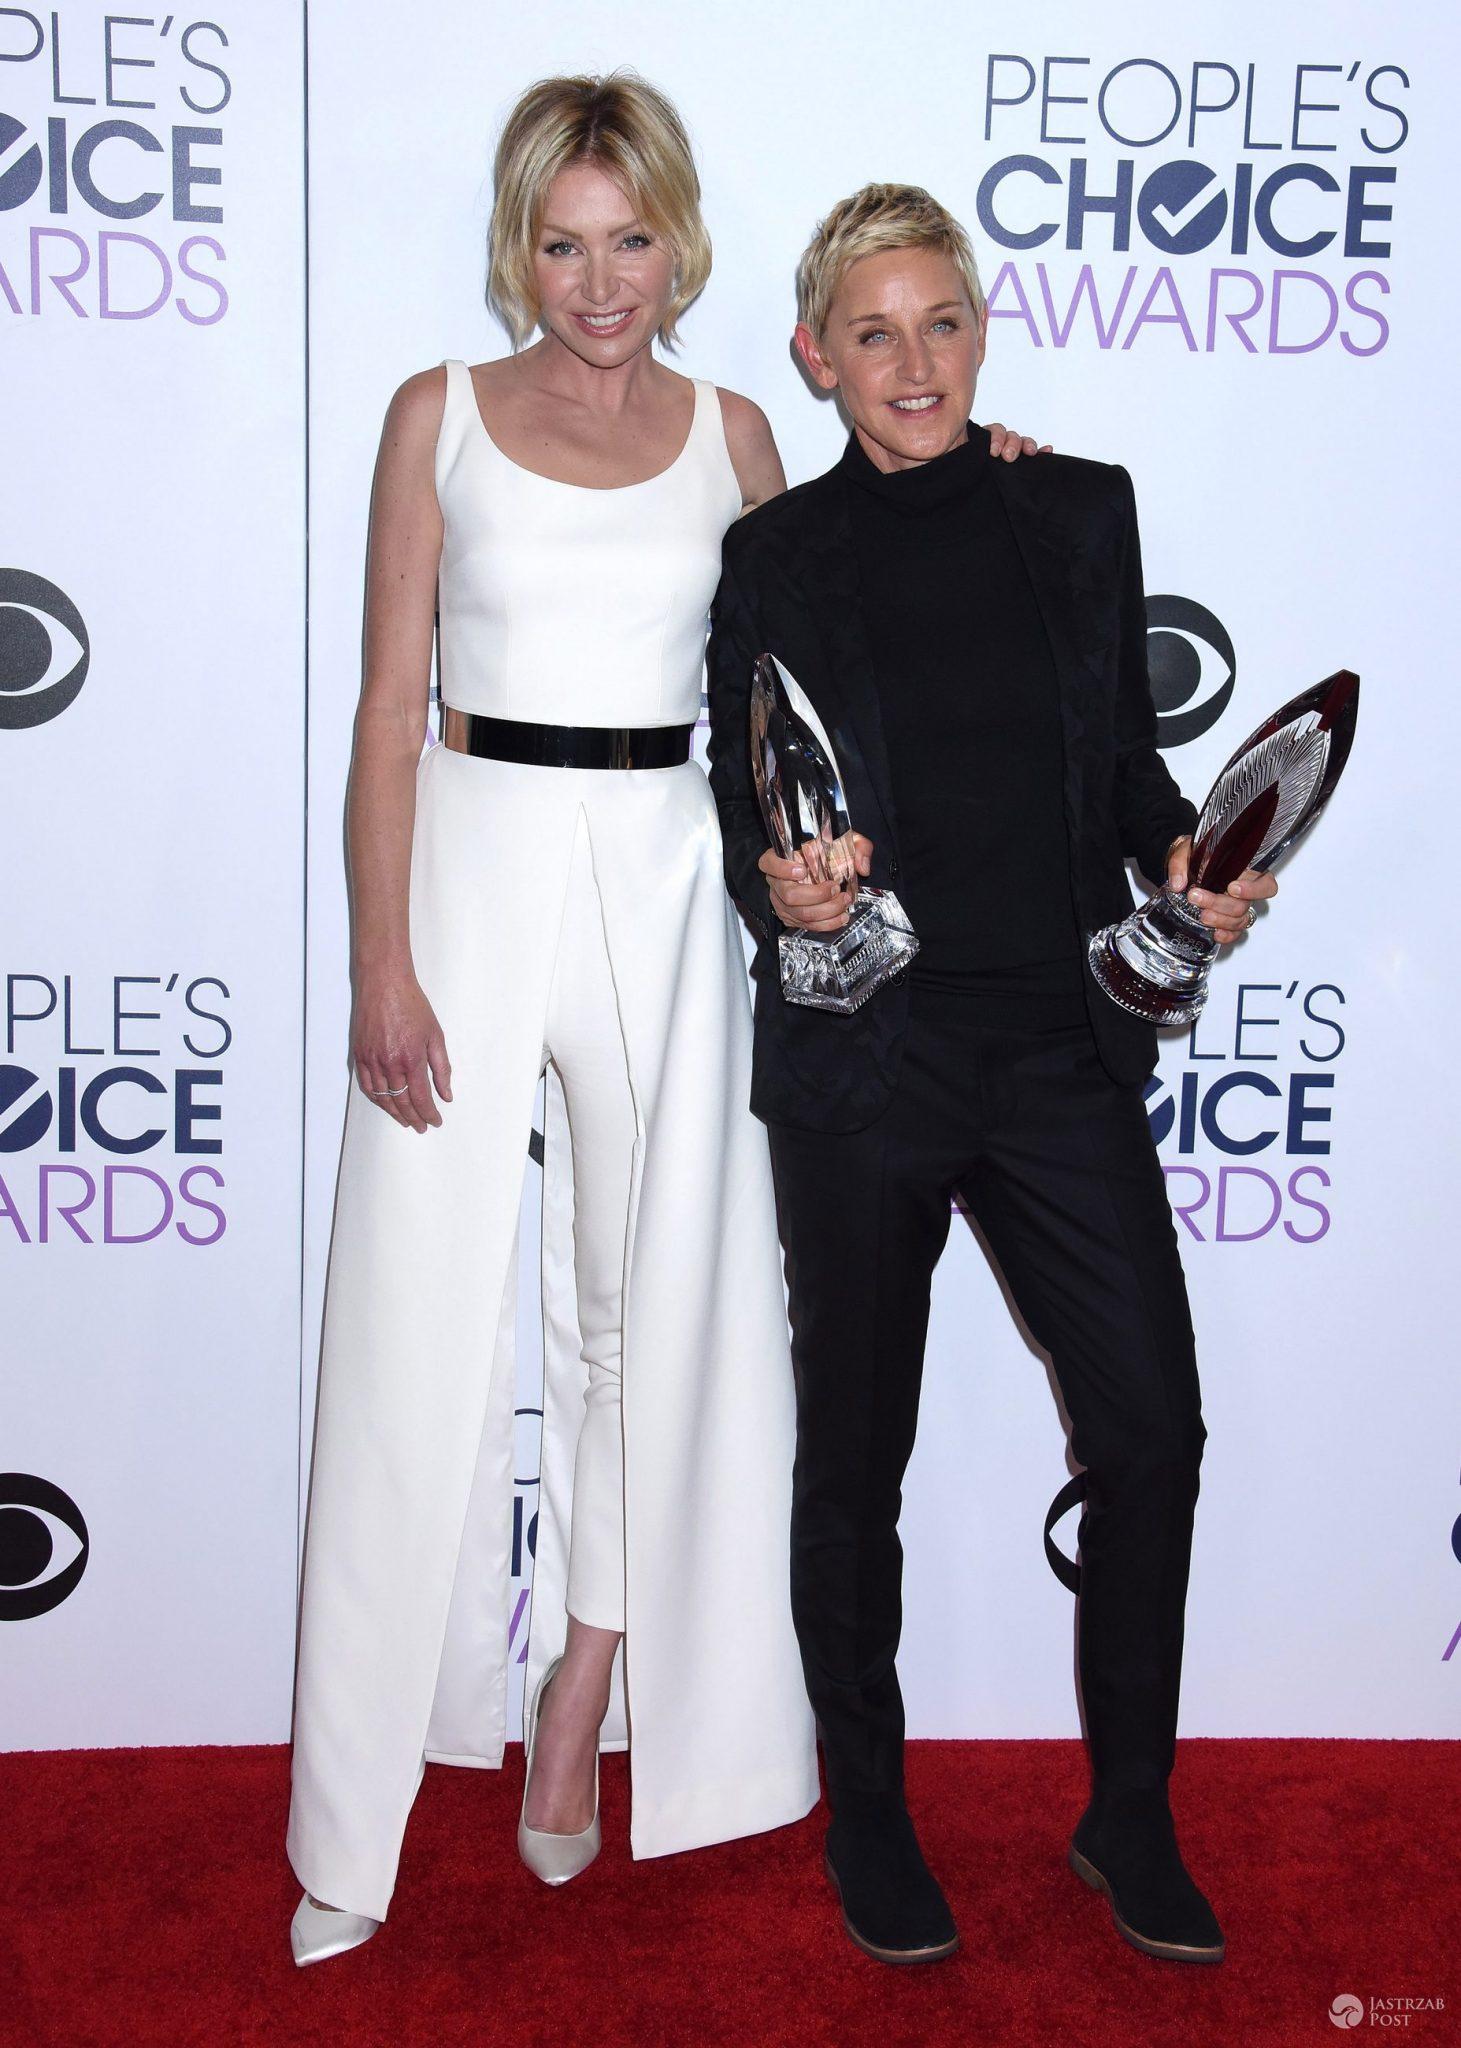 Portia De Rossi i Ellen DeGeneres mają kryzys w związku?